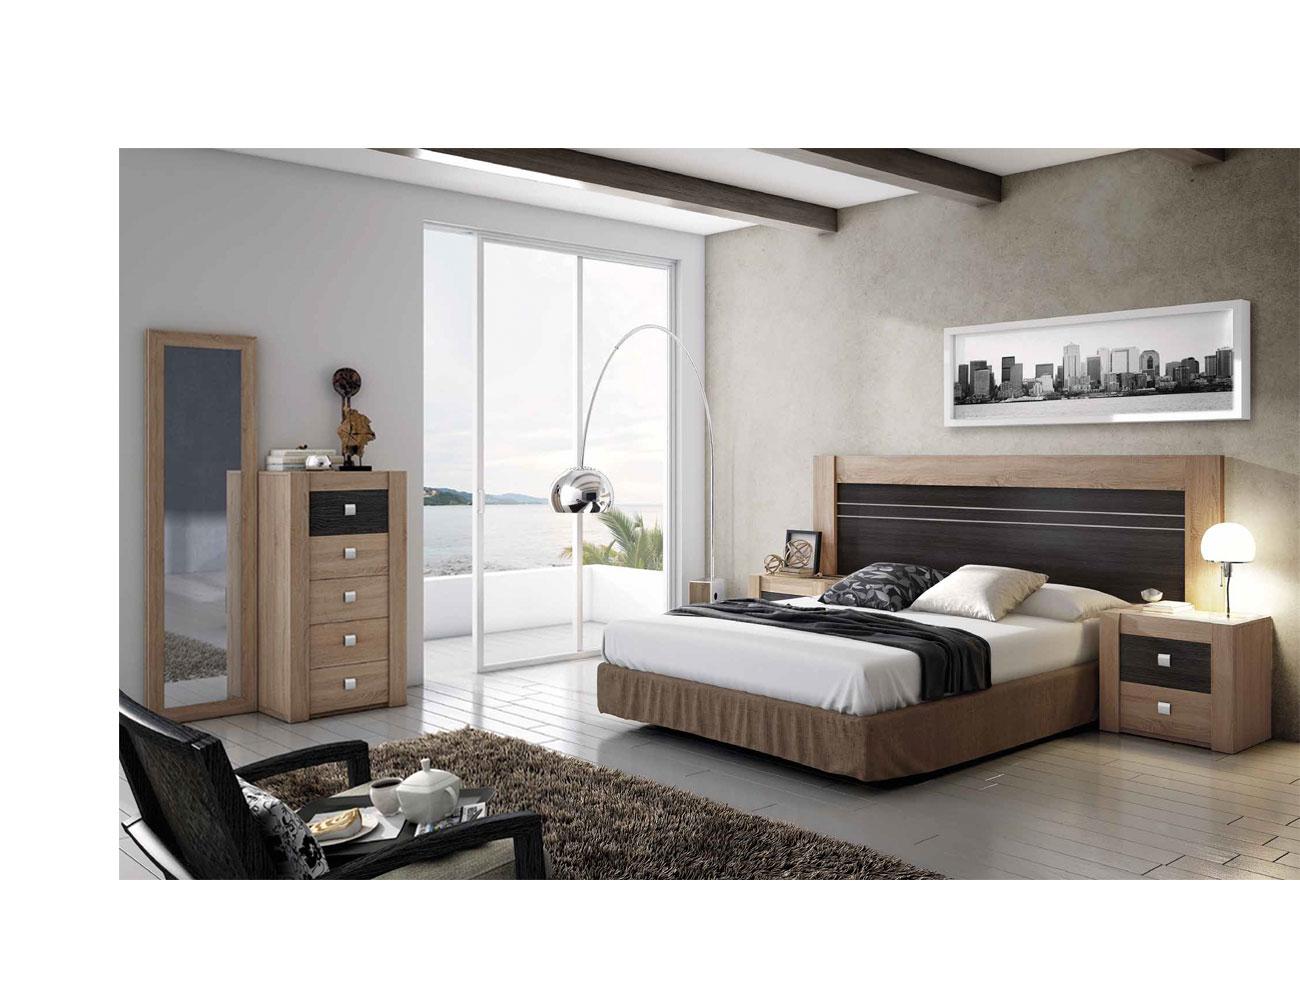 Dormitorio moderno cambrian ceniza 02